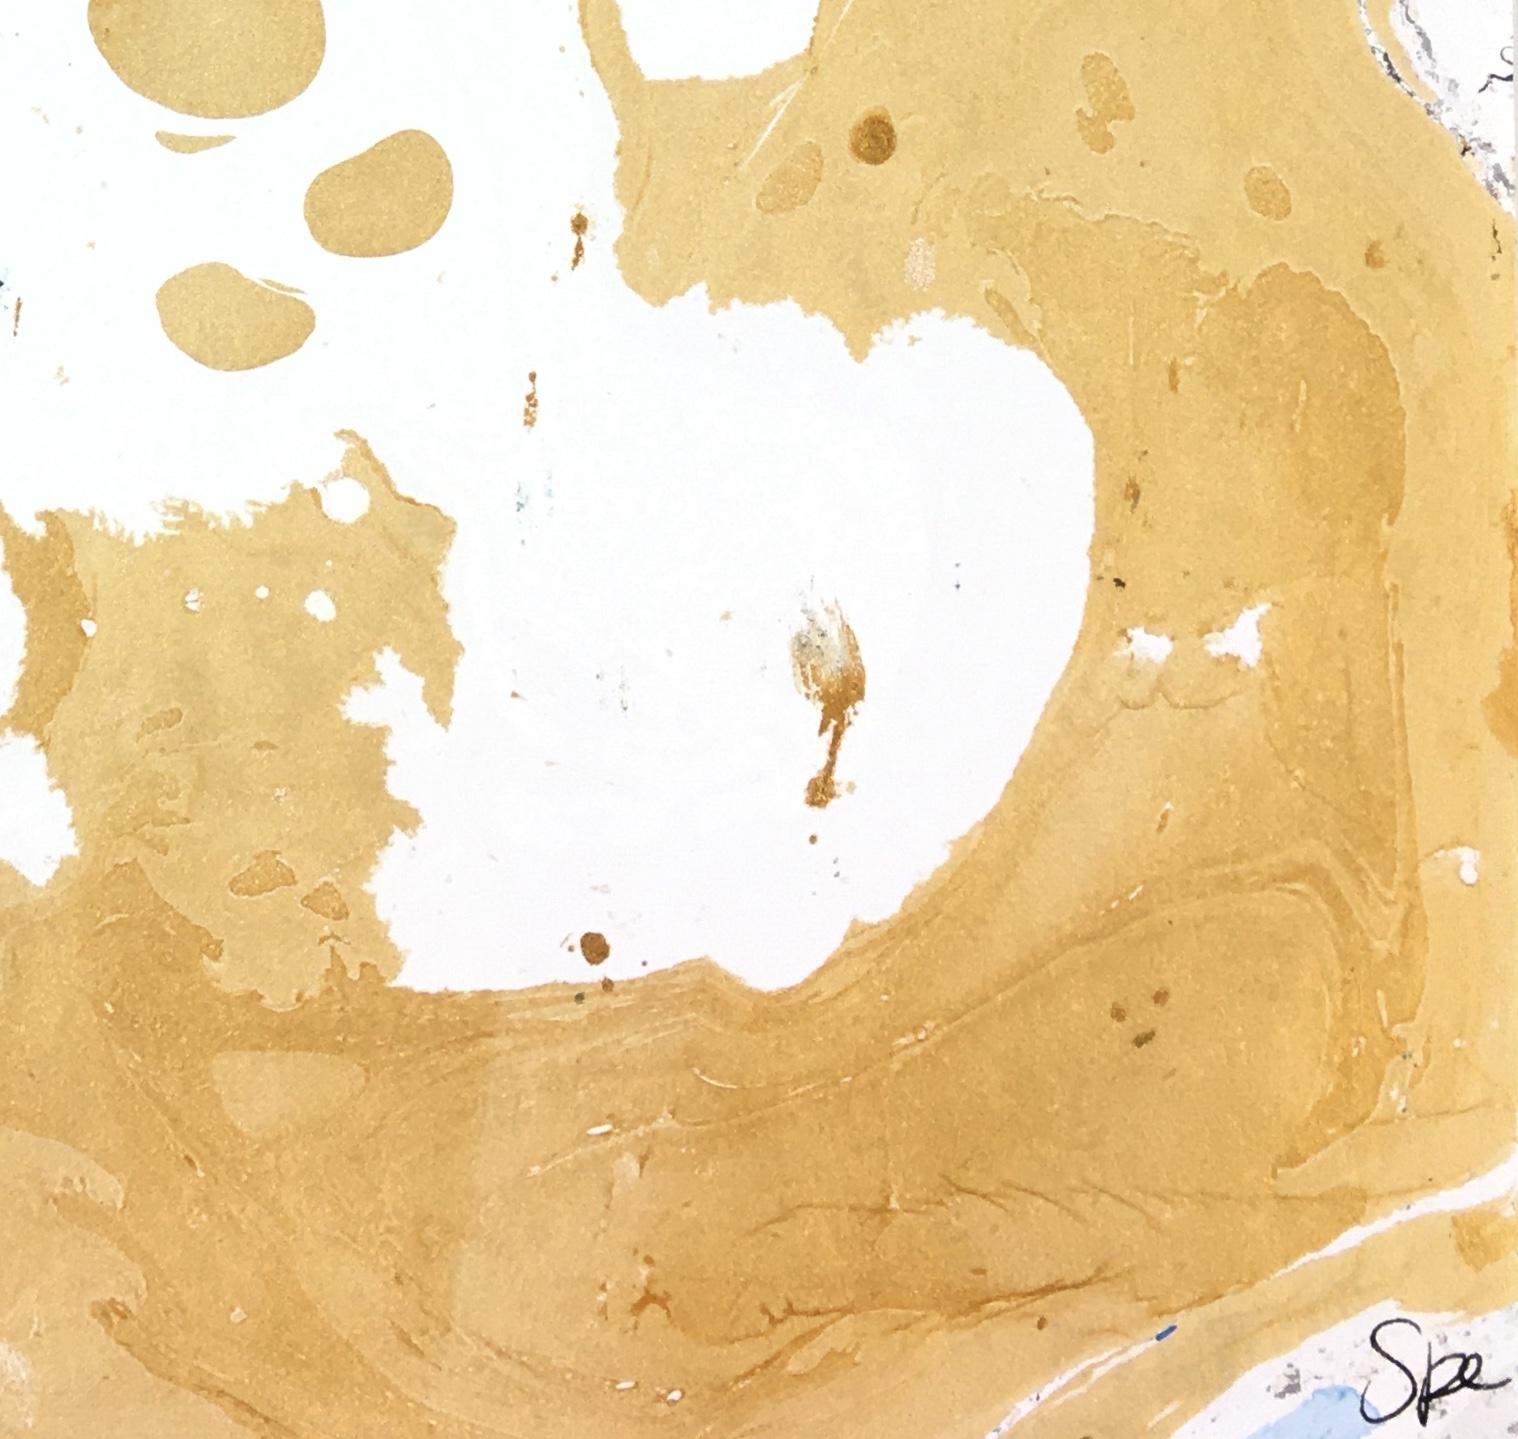 Modern Original Art - Black Gold Marble, Spe, 2018